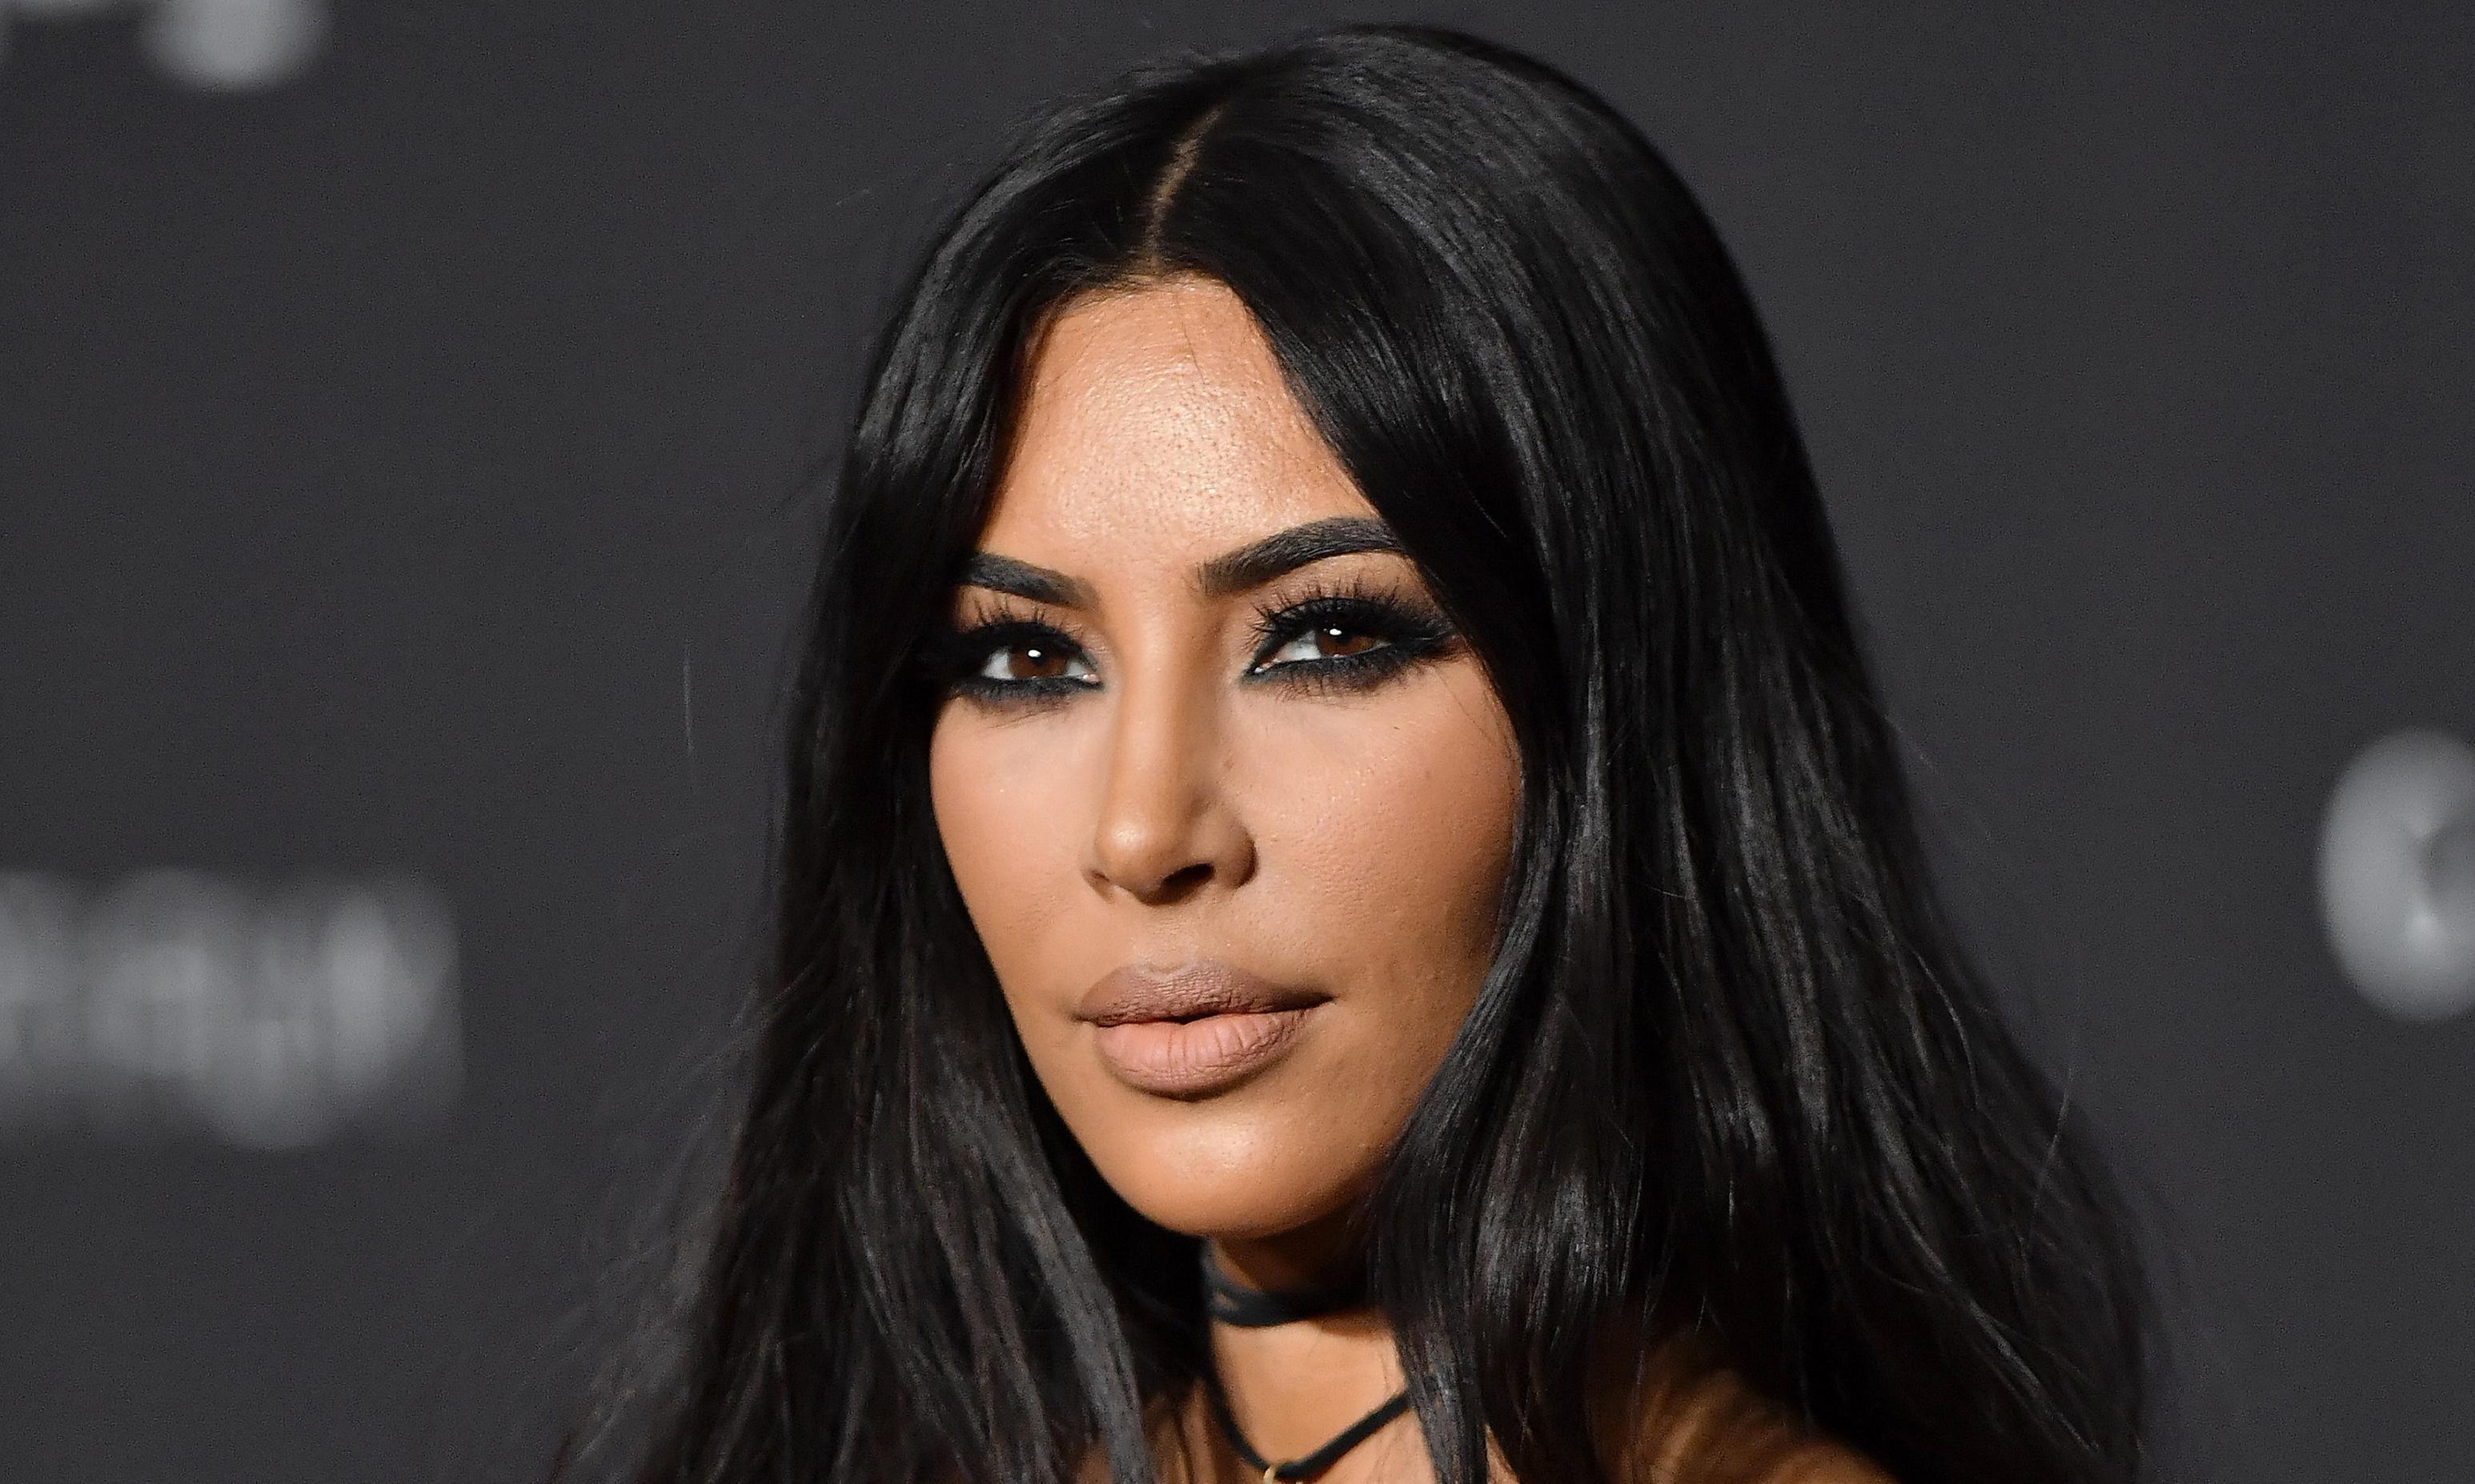 Kim Kardashian West's Kimono shapewear touches nerve in Japan